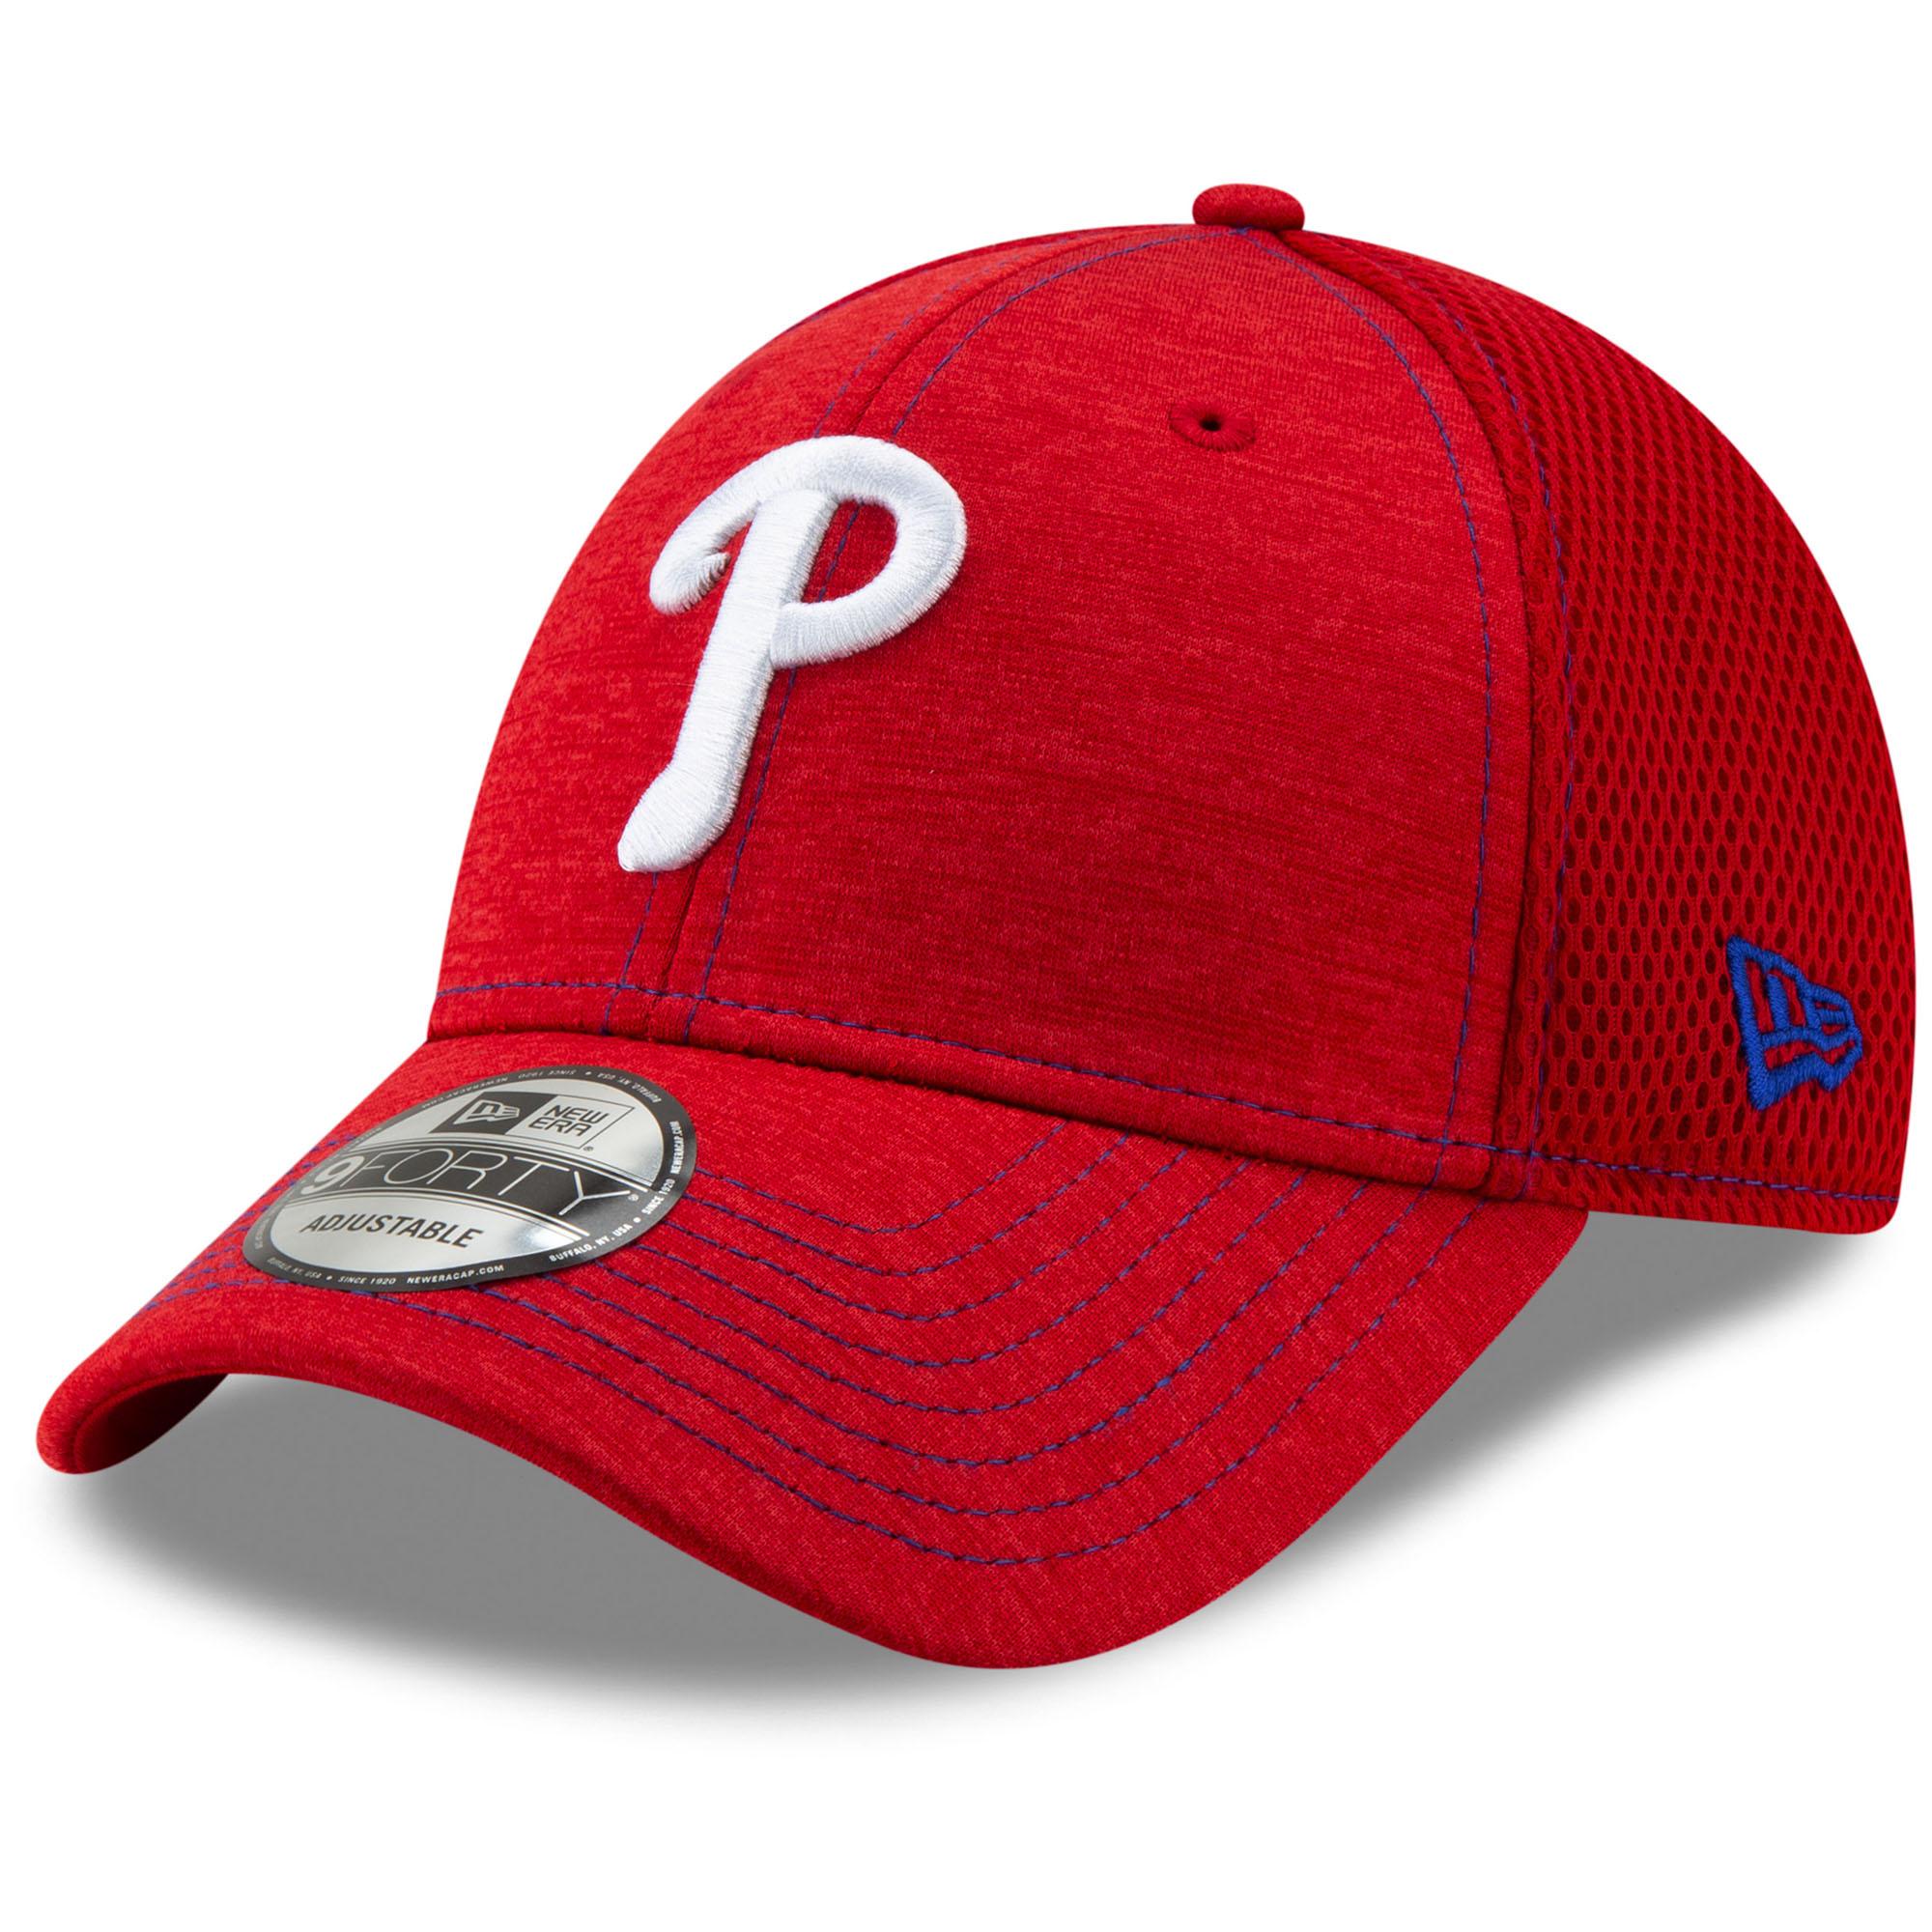 Philadelphia Phillies New Era Youth Team Tread 9FORTY Adjustable Hat - Red - OSFA